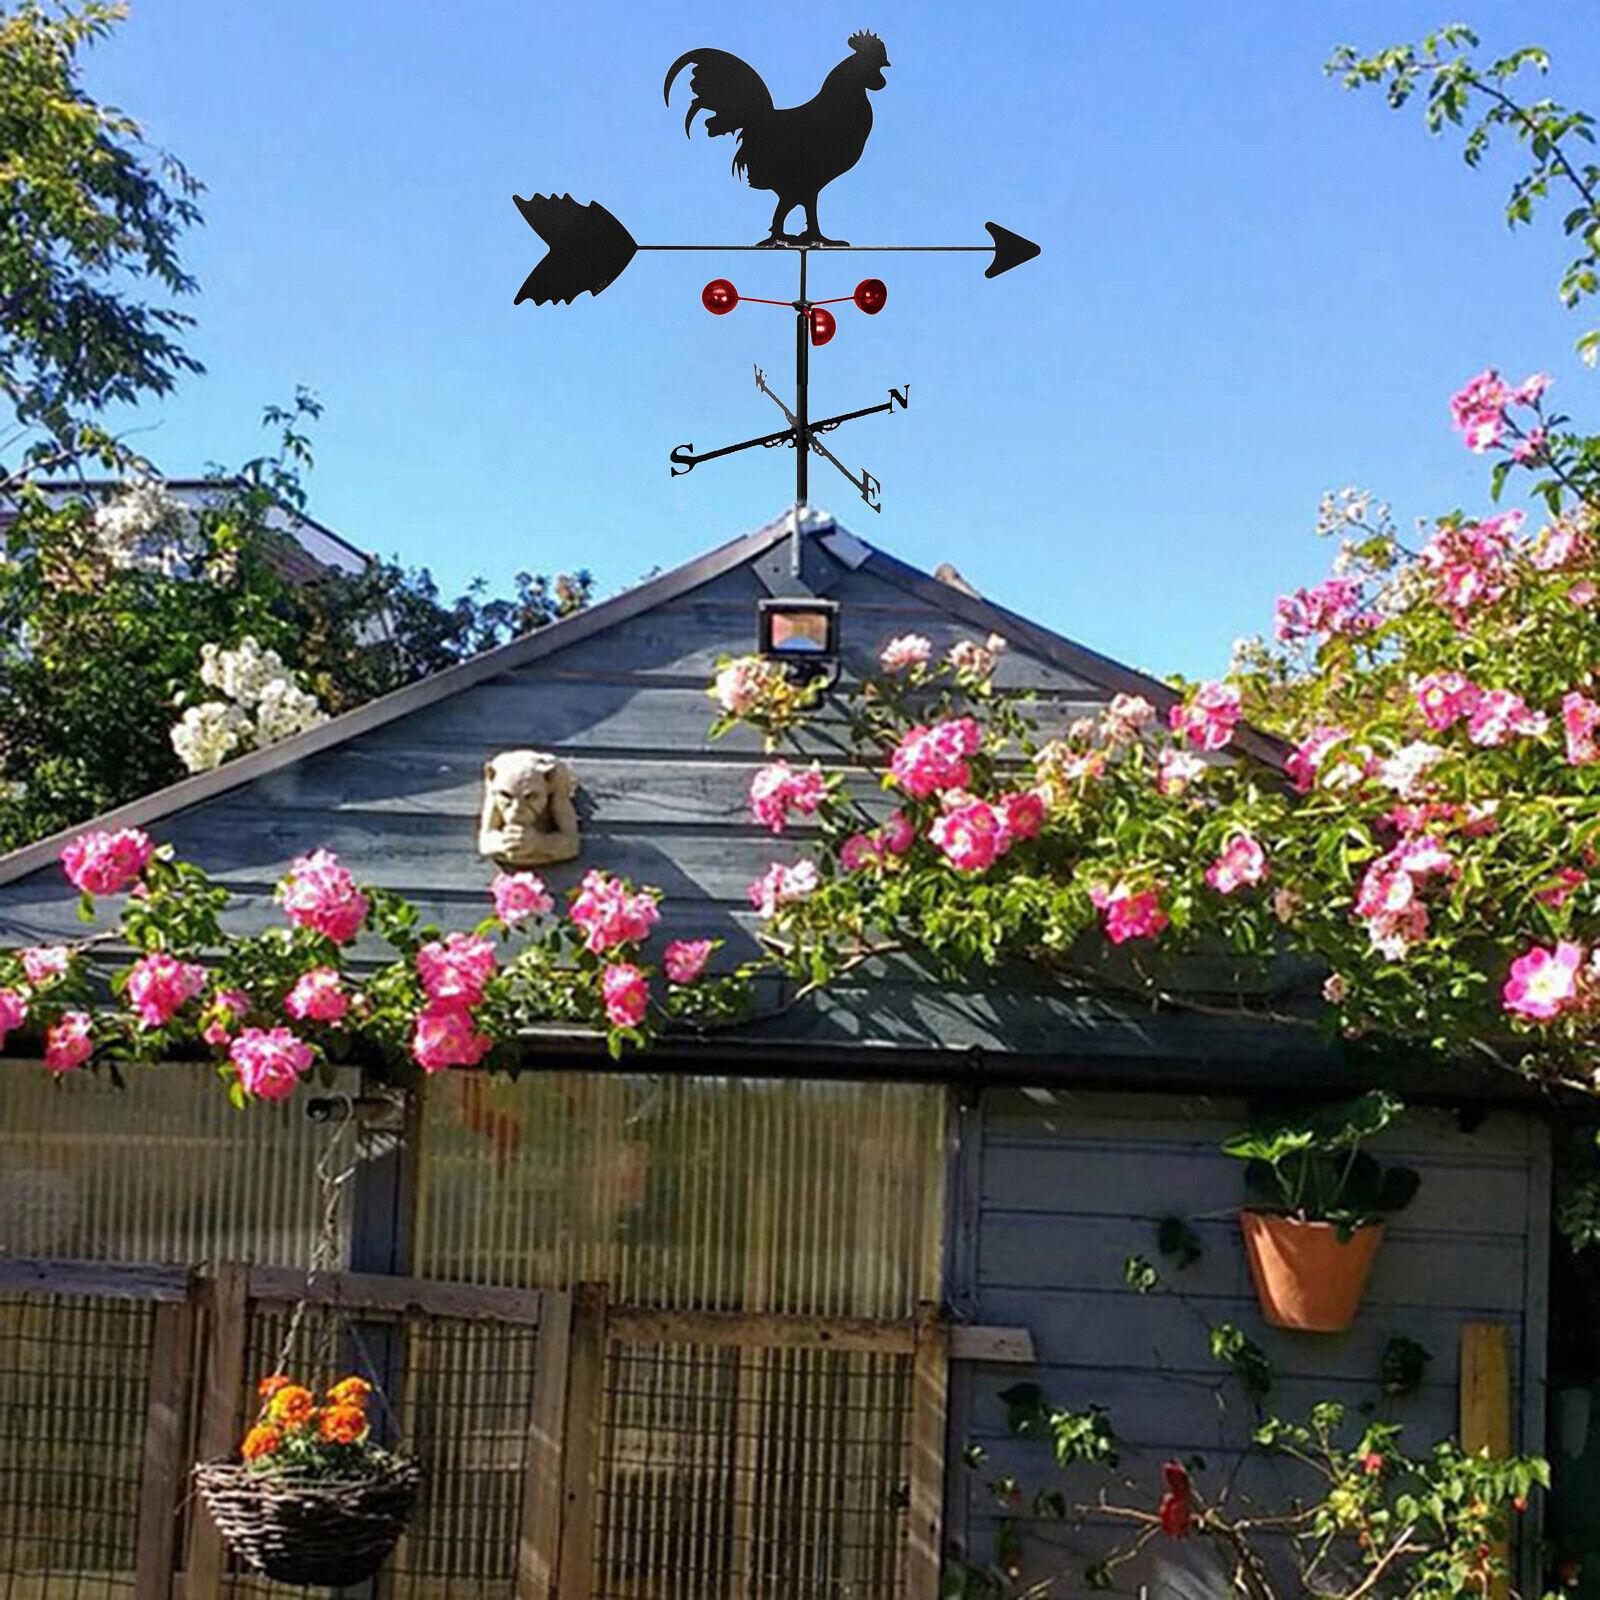 Retro Cock Shape Weathervane Fence Mount Wind Direction Indicator Barn Decor